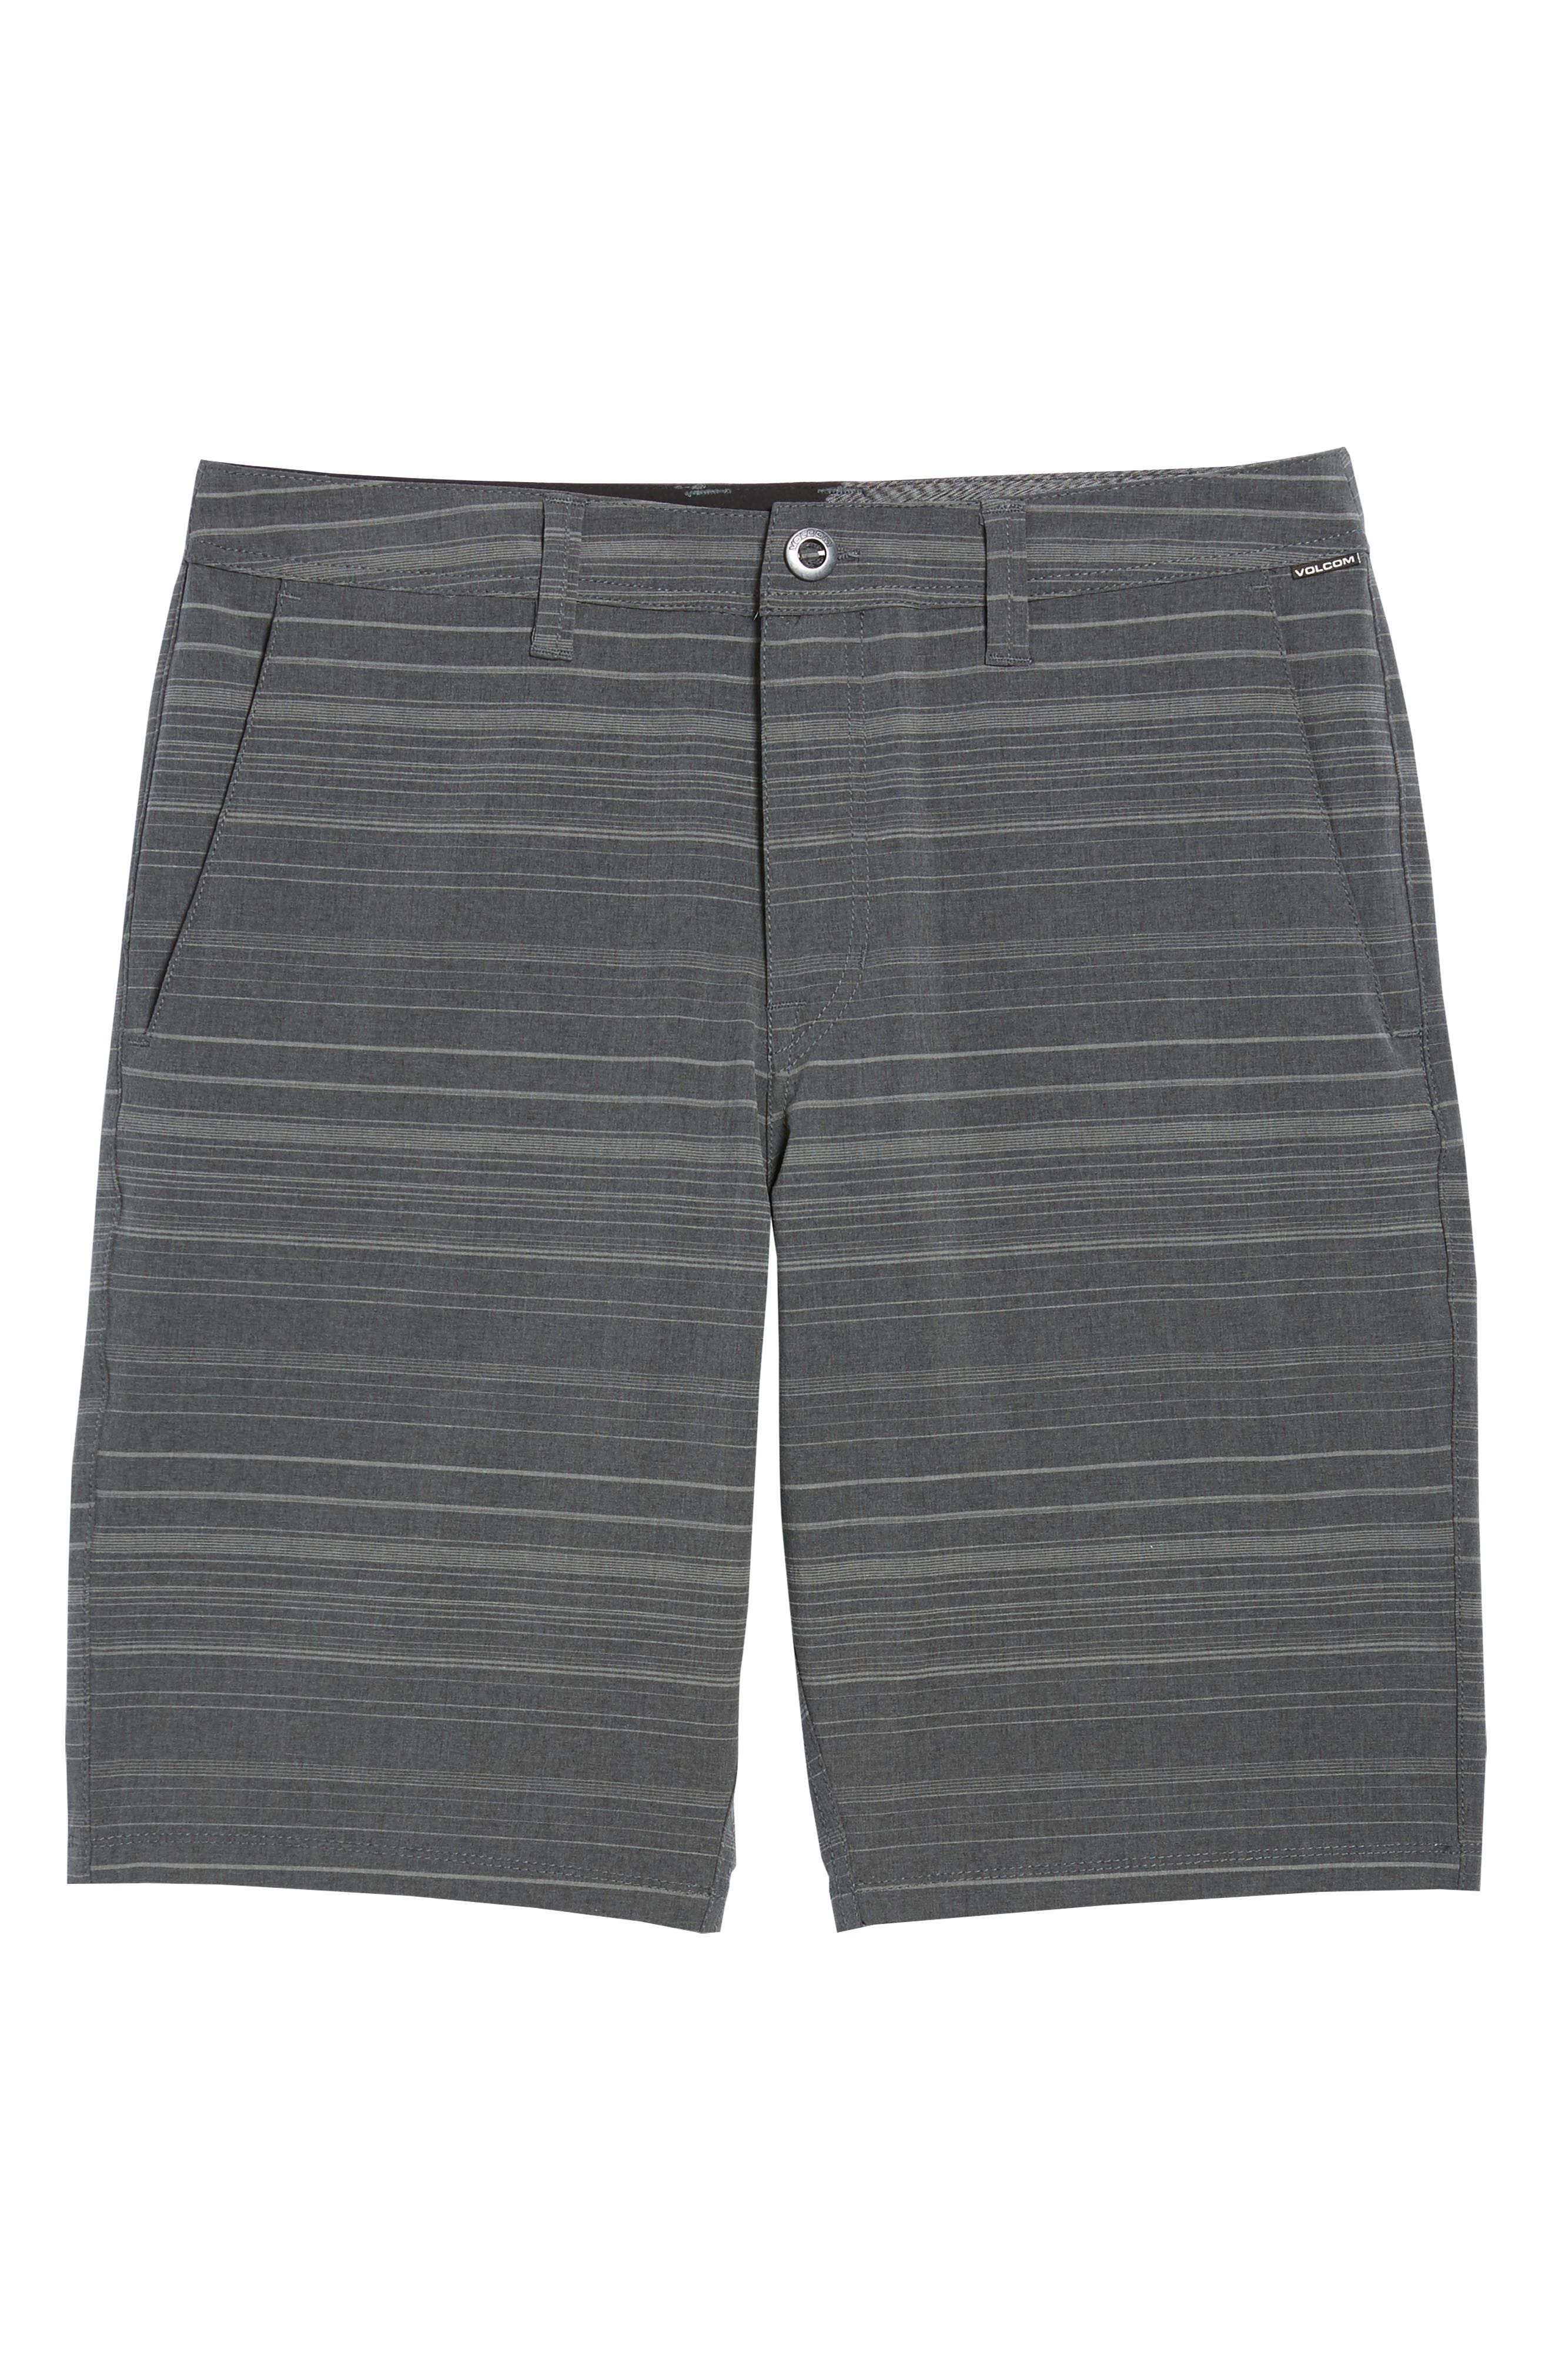 Surf N' Turf Mix Hybrid Shorts,                             Alternate thumbnail 29, color,